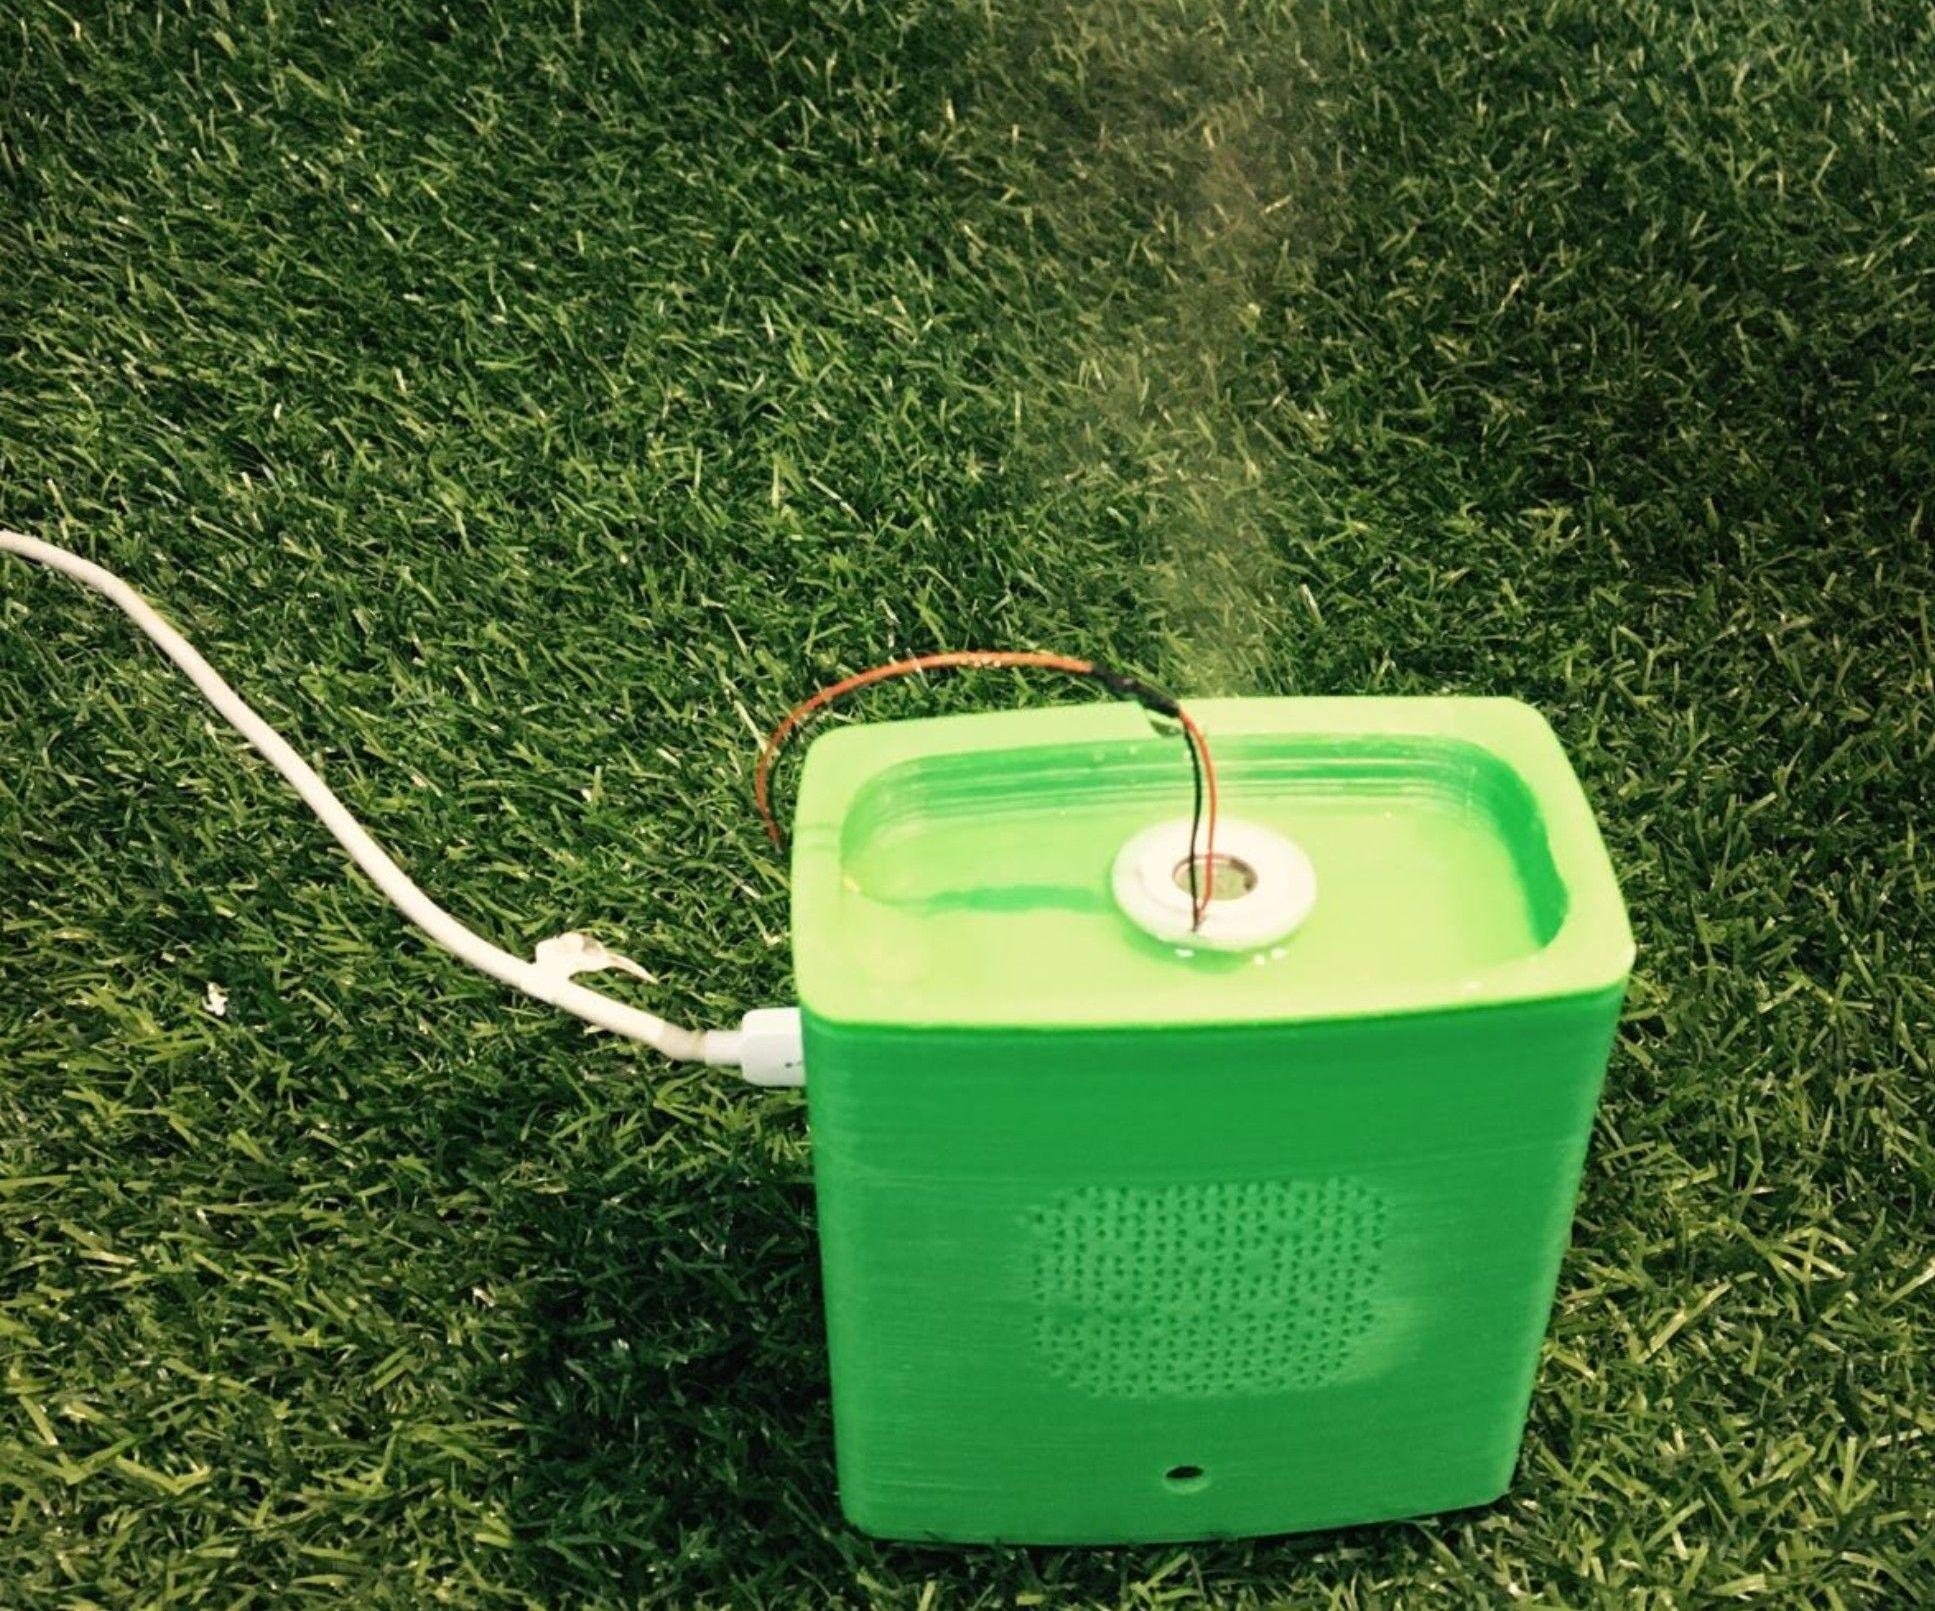 DIY Smart House 2 - DIY a Humidifier